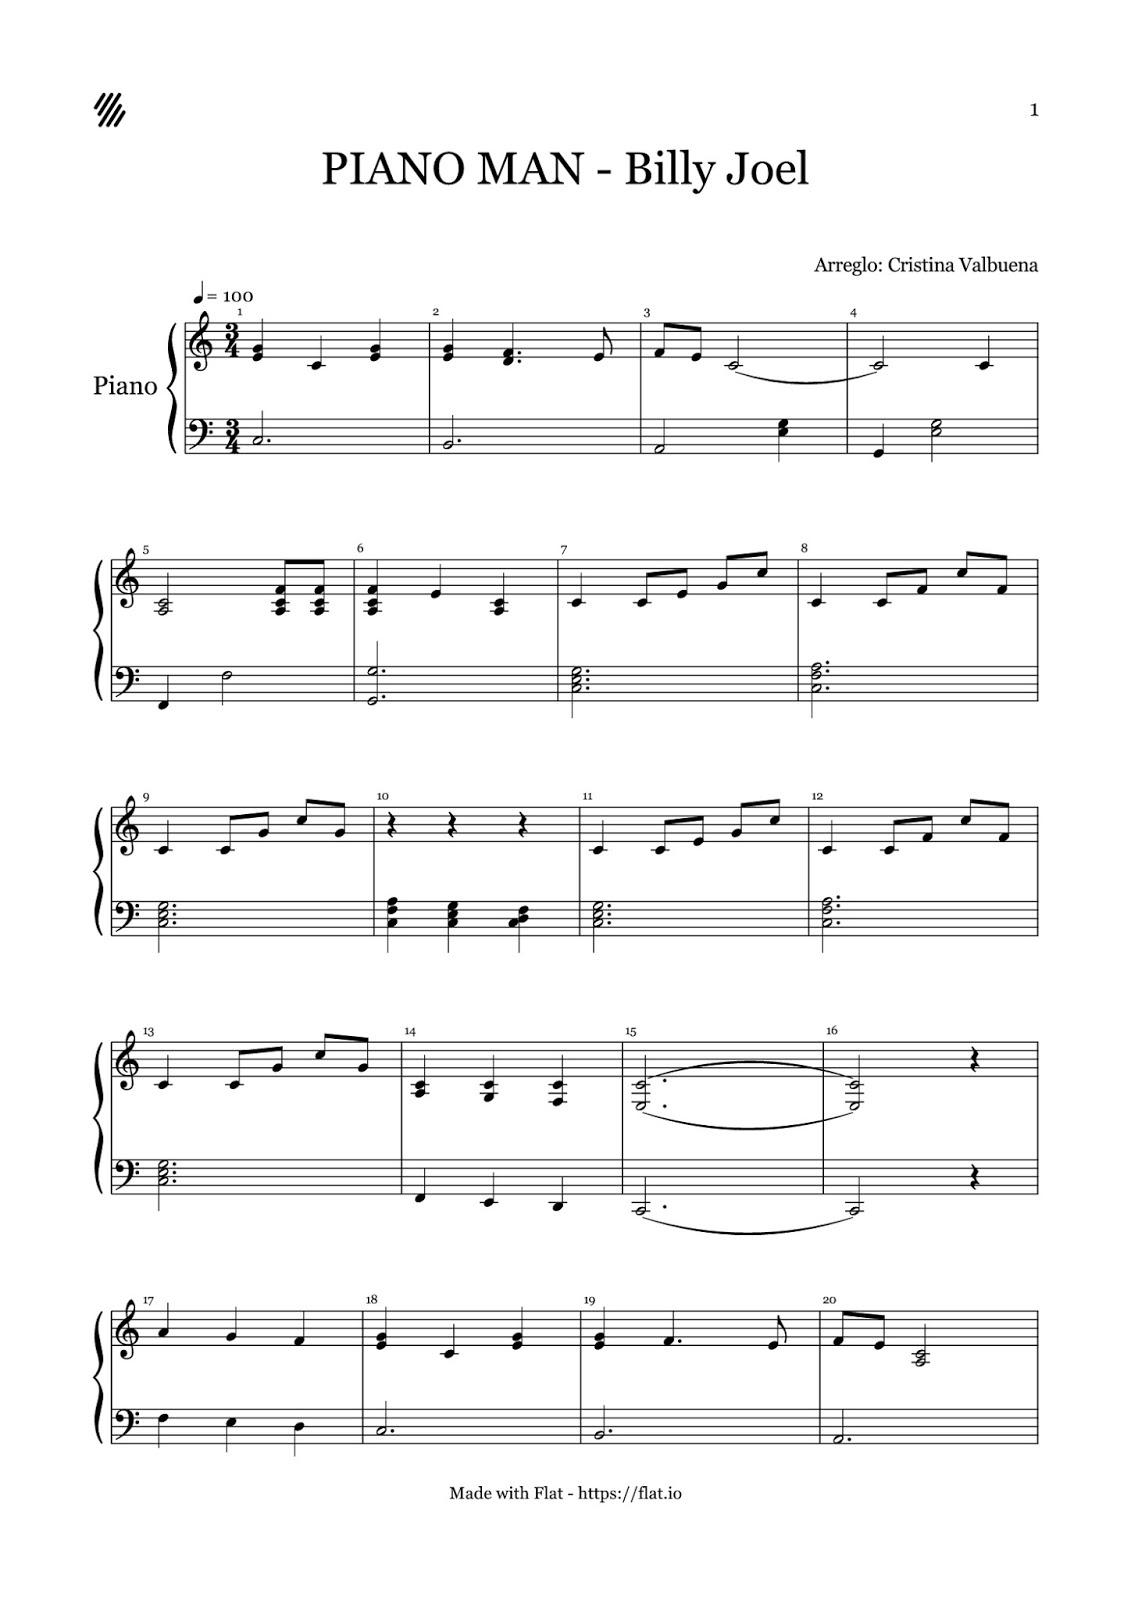 Partitura f cil piano man billy joel for 1 5 piani casa piani